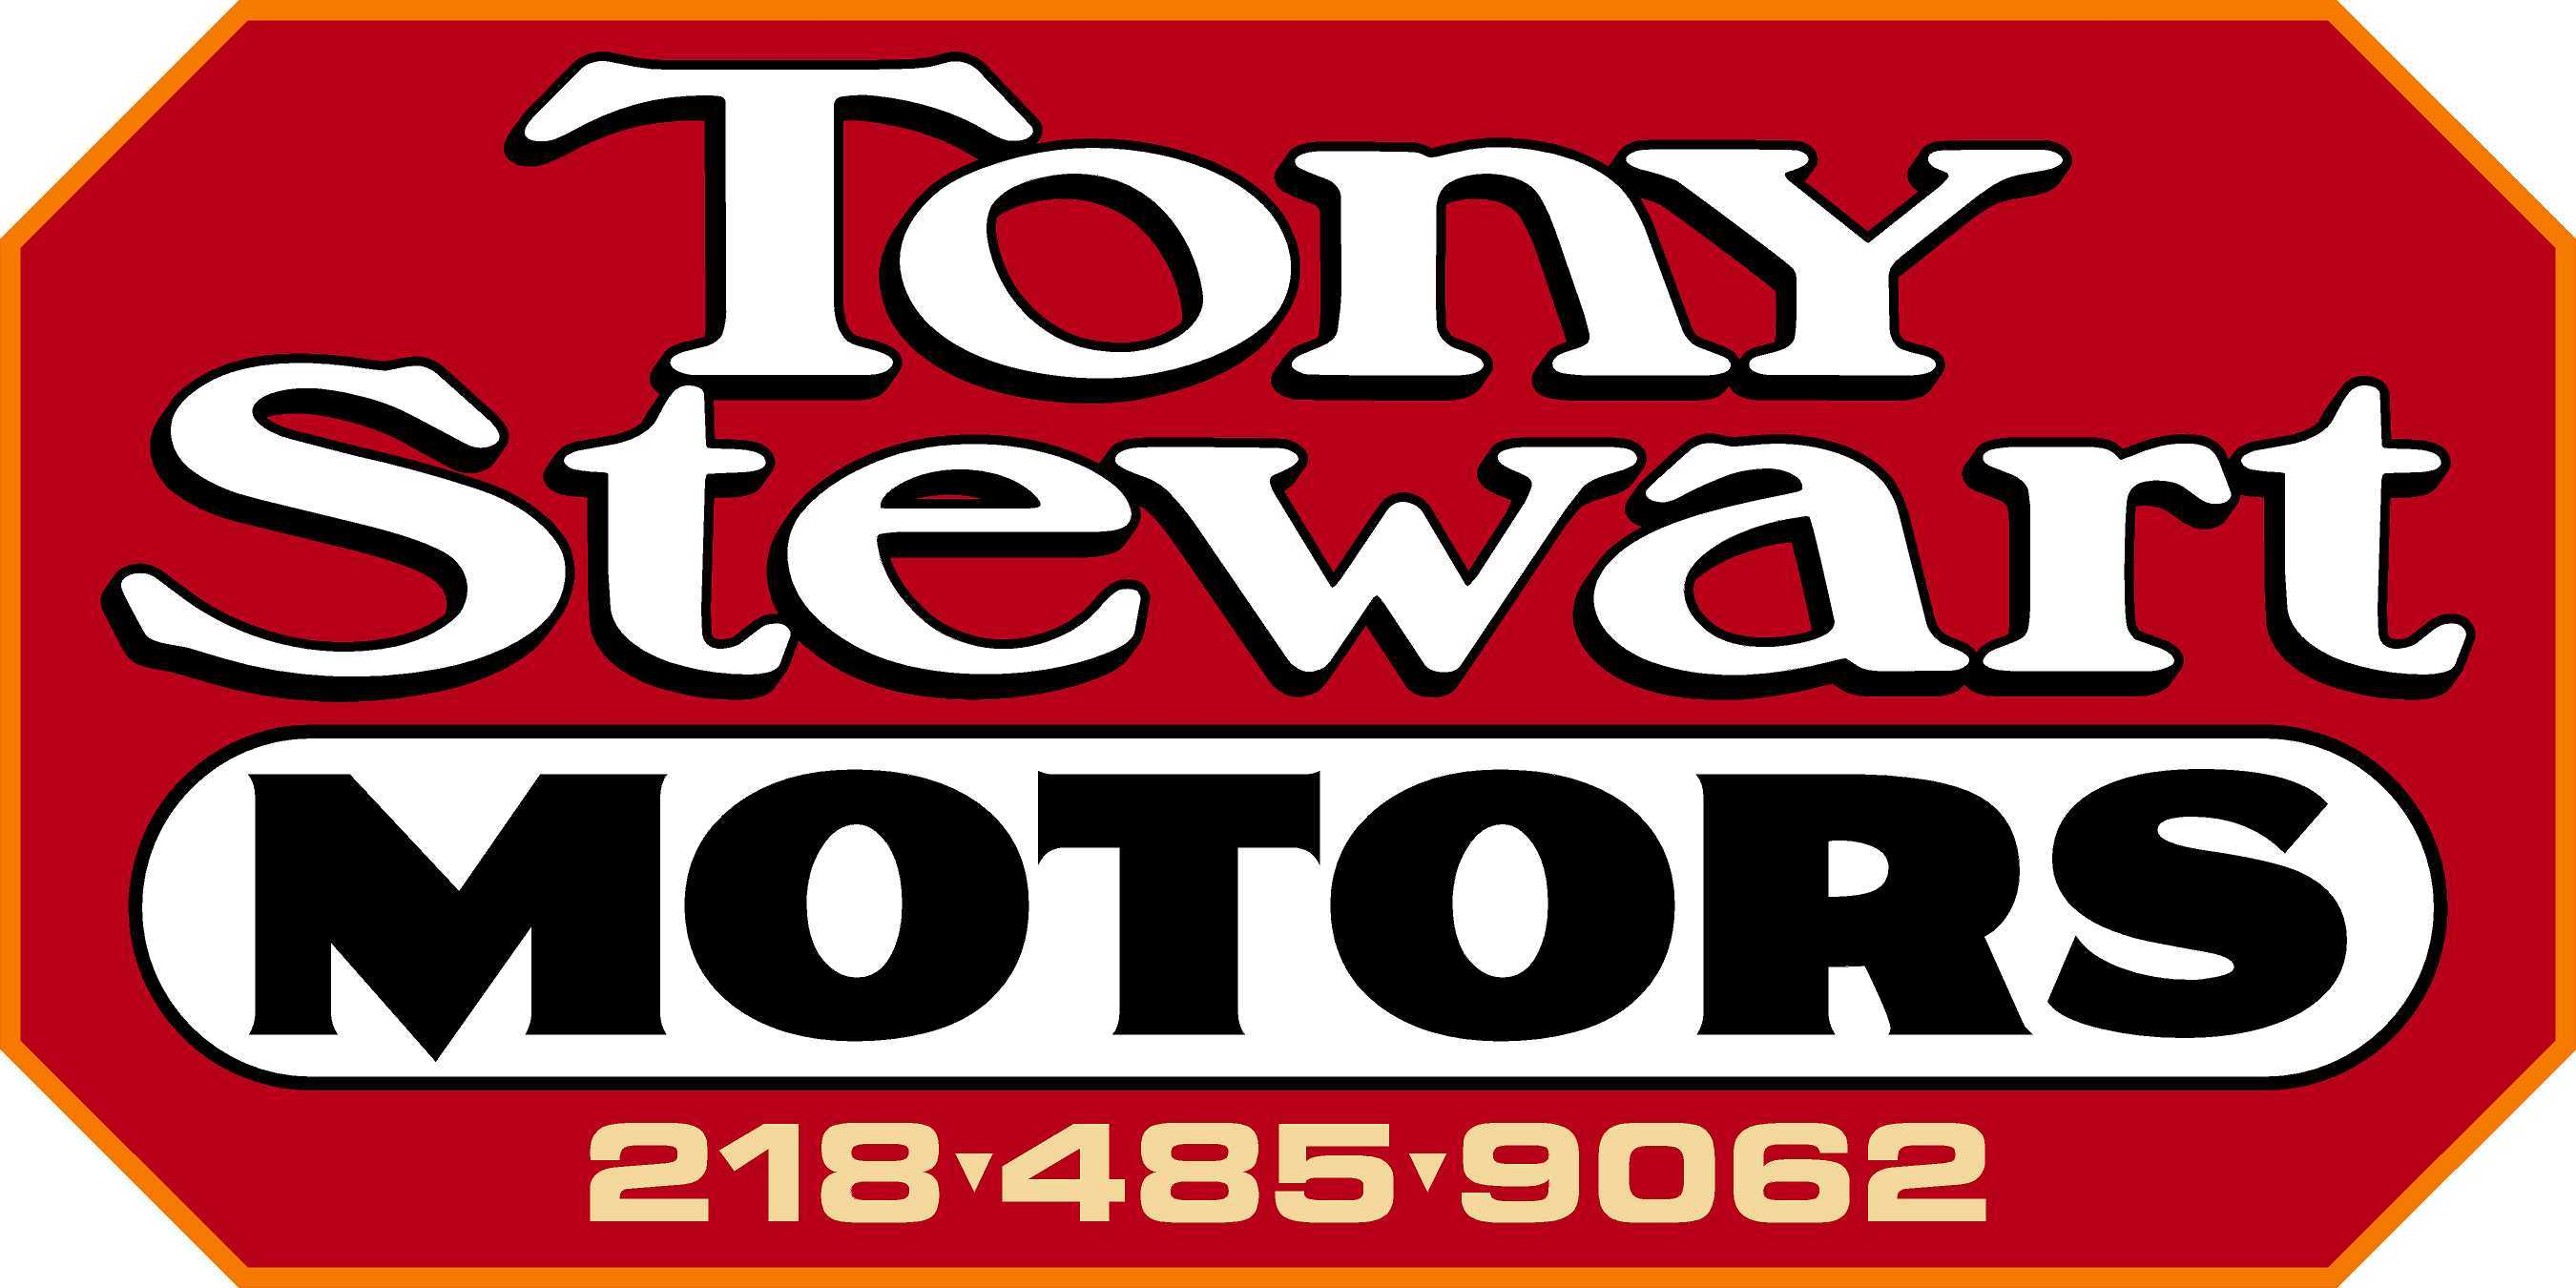 Tony Stewart Motors